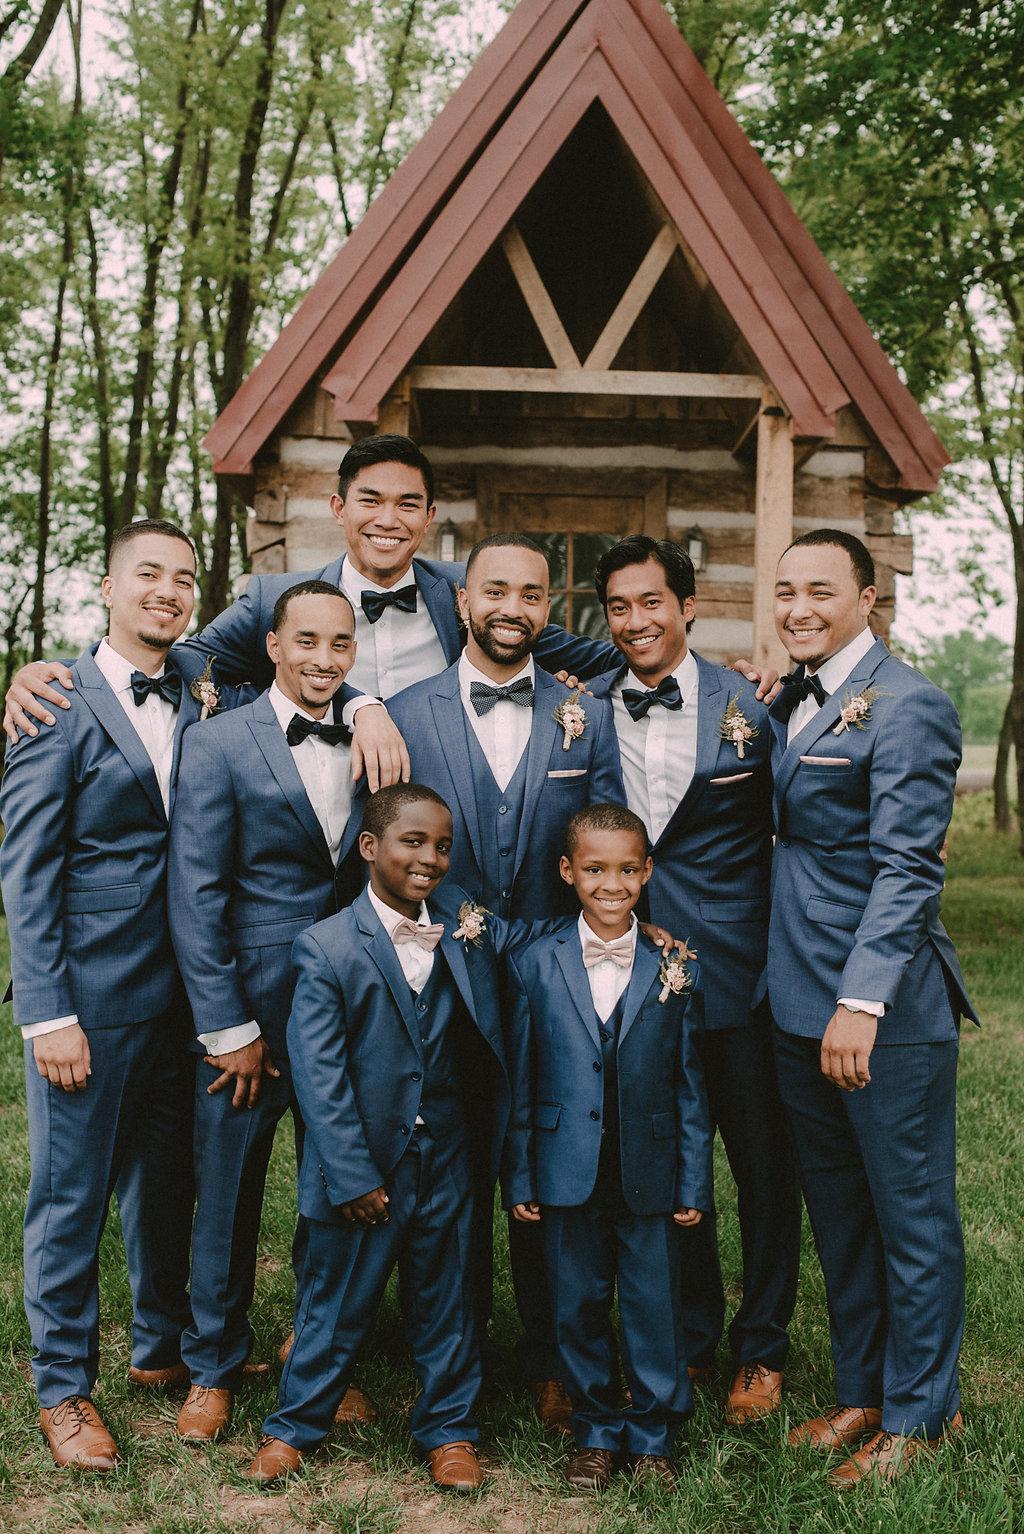 dapper Groom and groomsmen photo